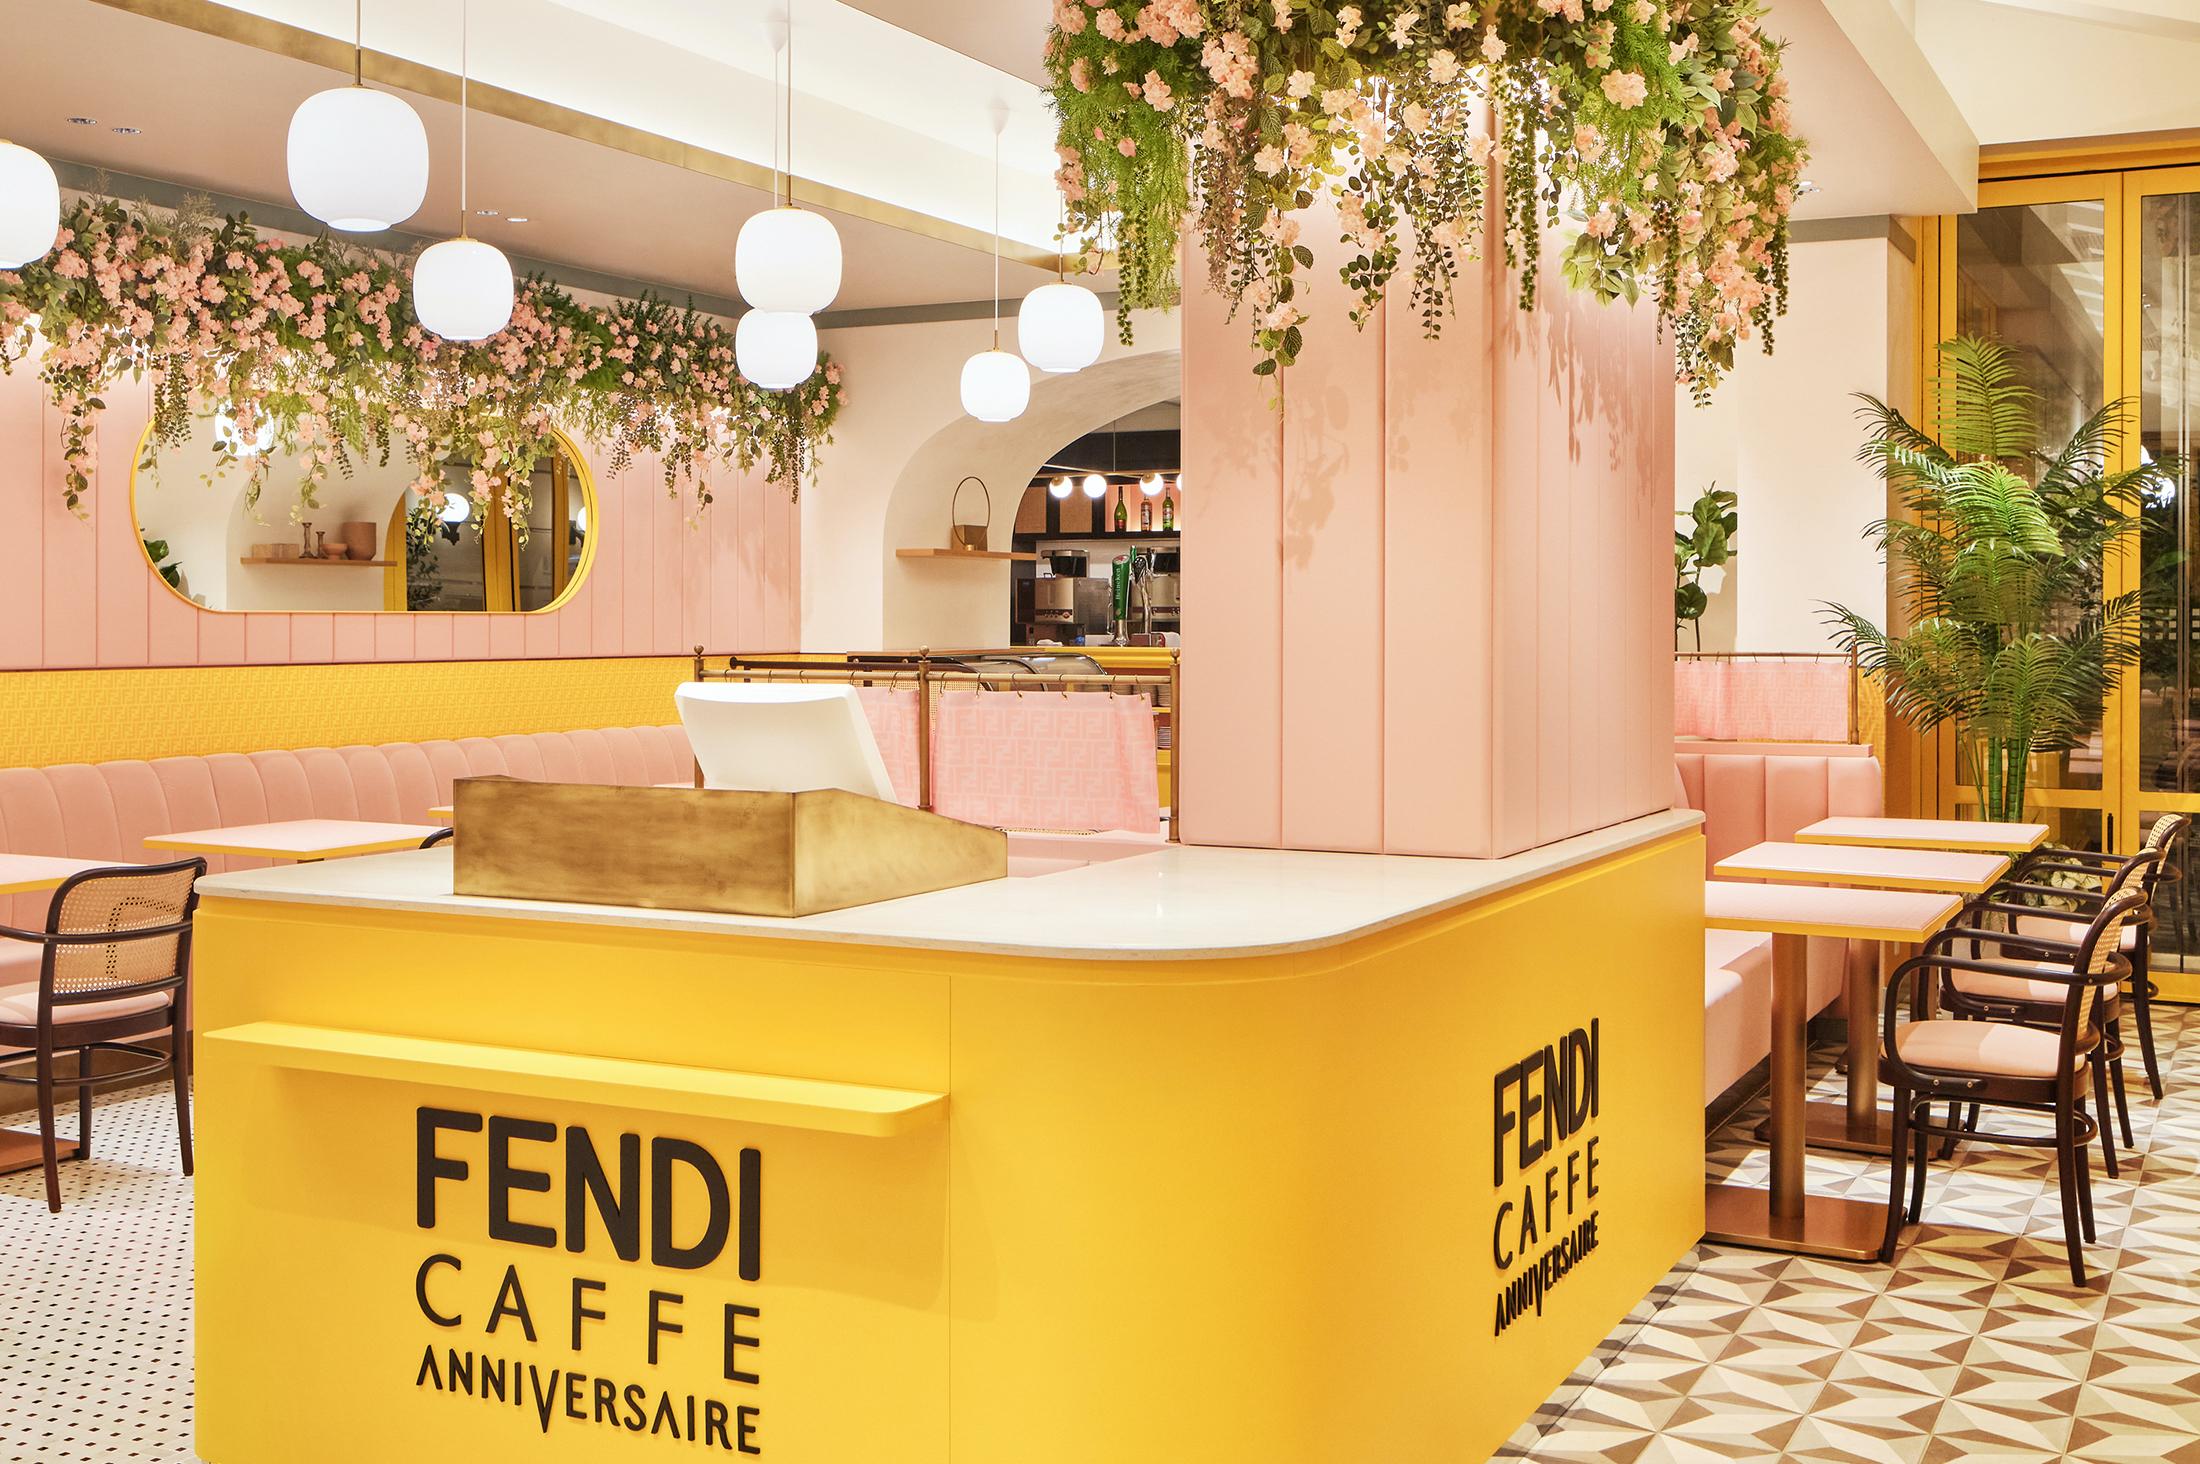 Fendi Partners With Anniversaire Café Omotesando For 'Fendi Cafe'